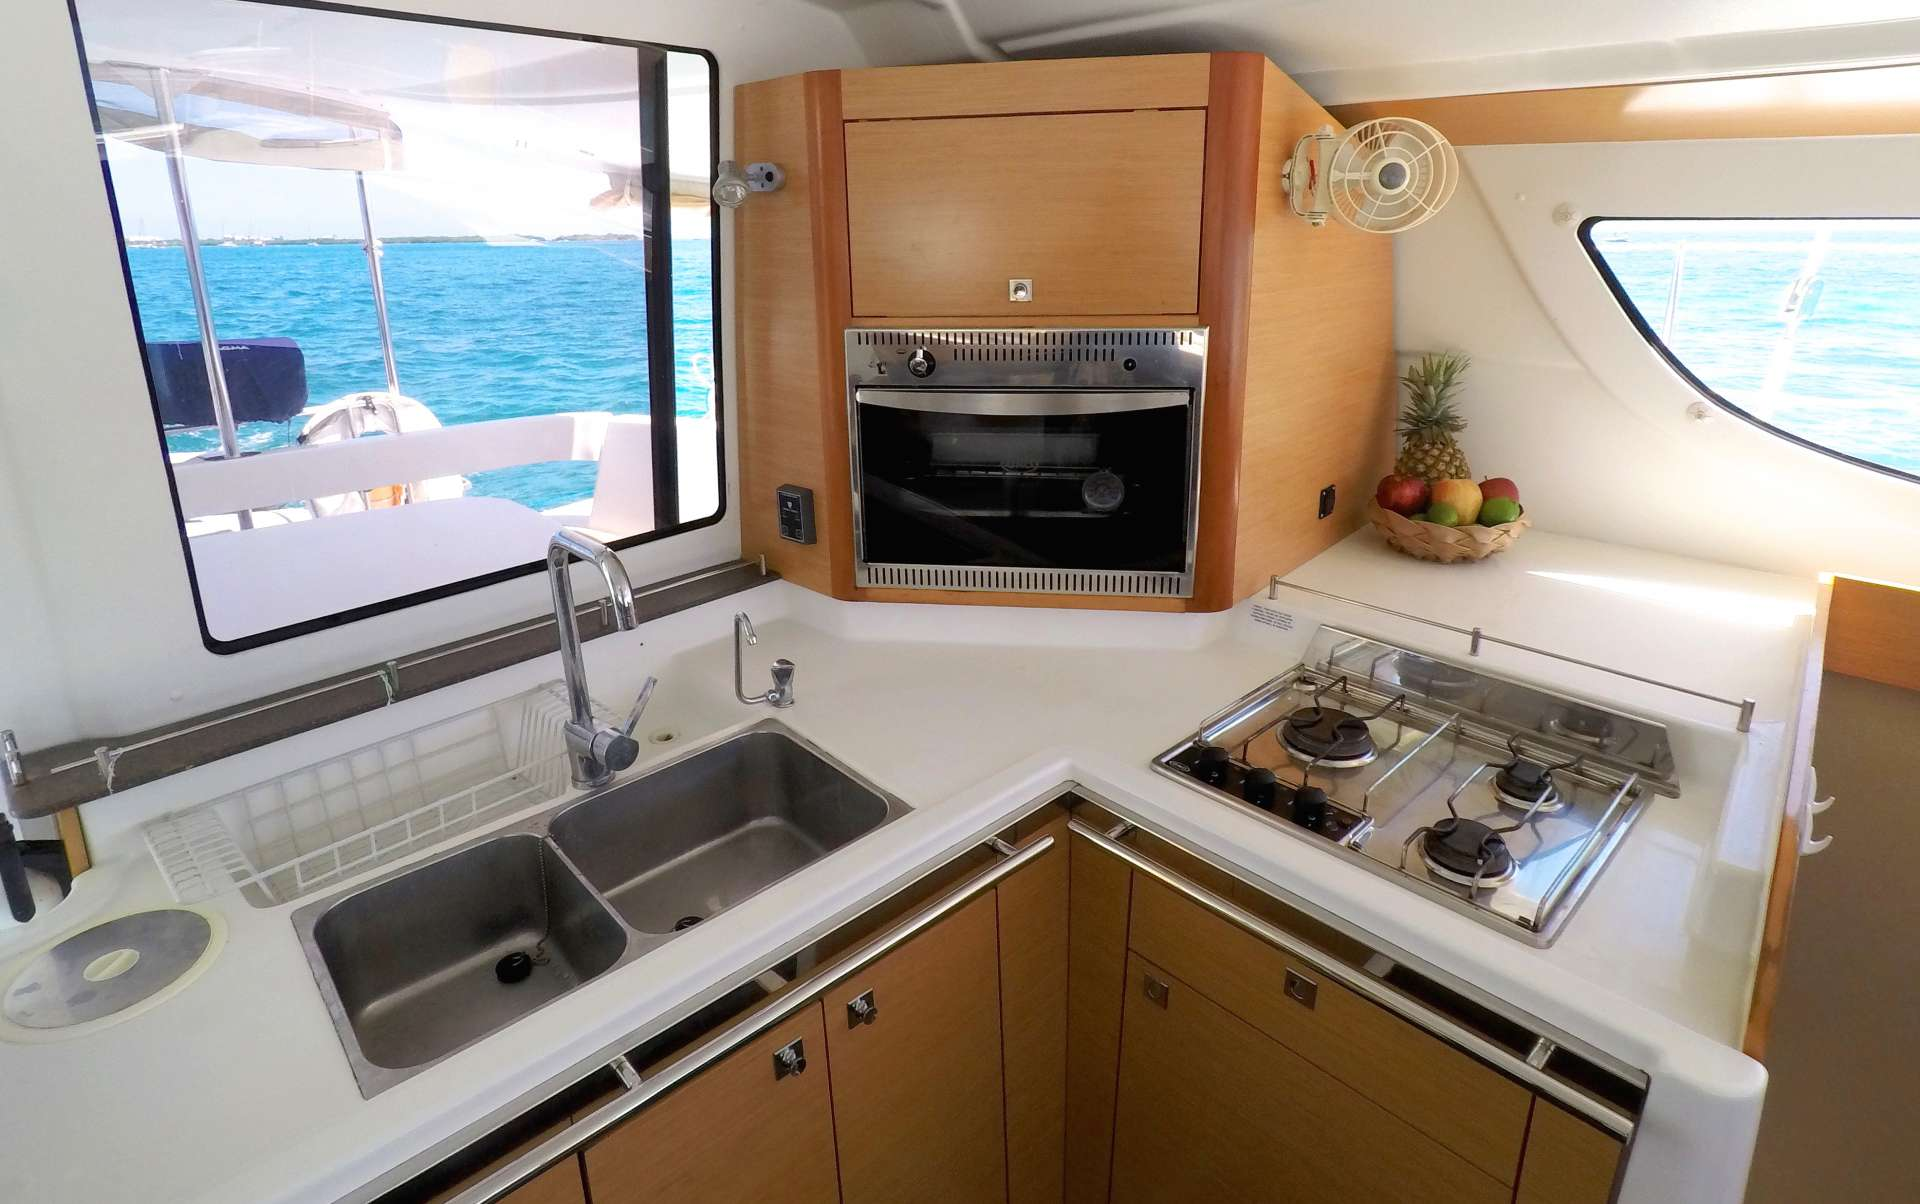 SAIL PENDING yacht image # 7